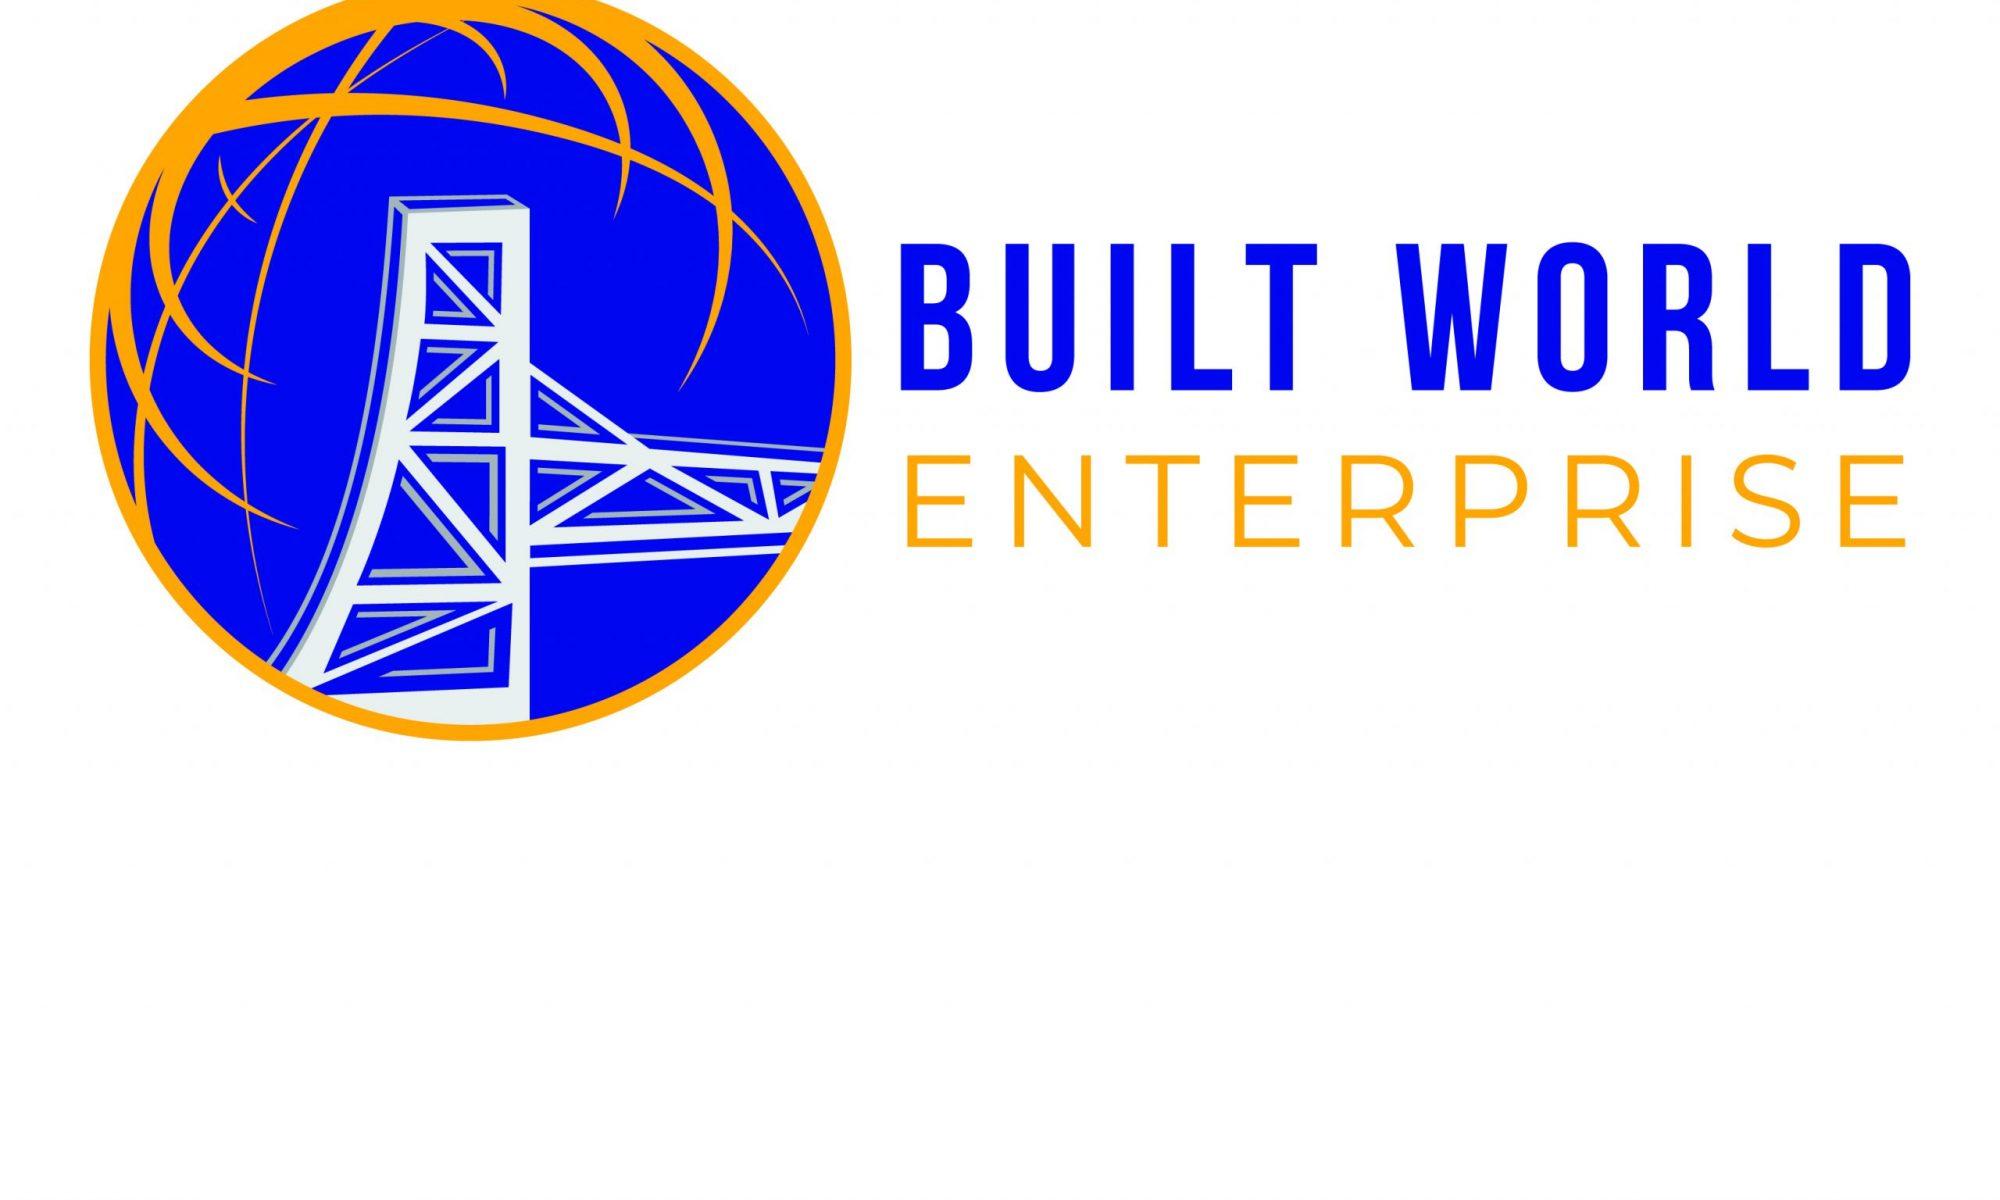 Built World Enterprise